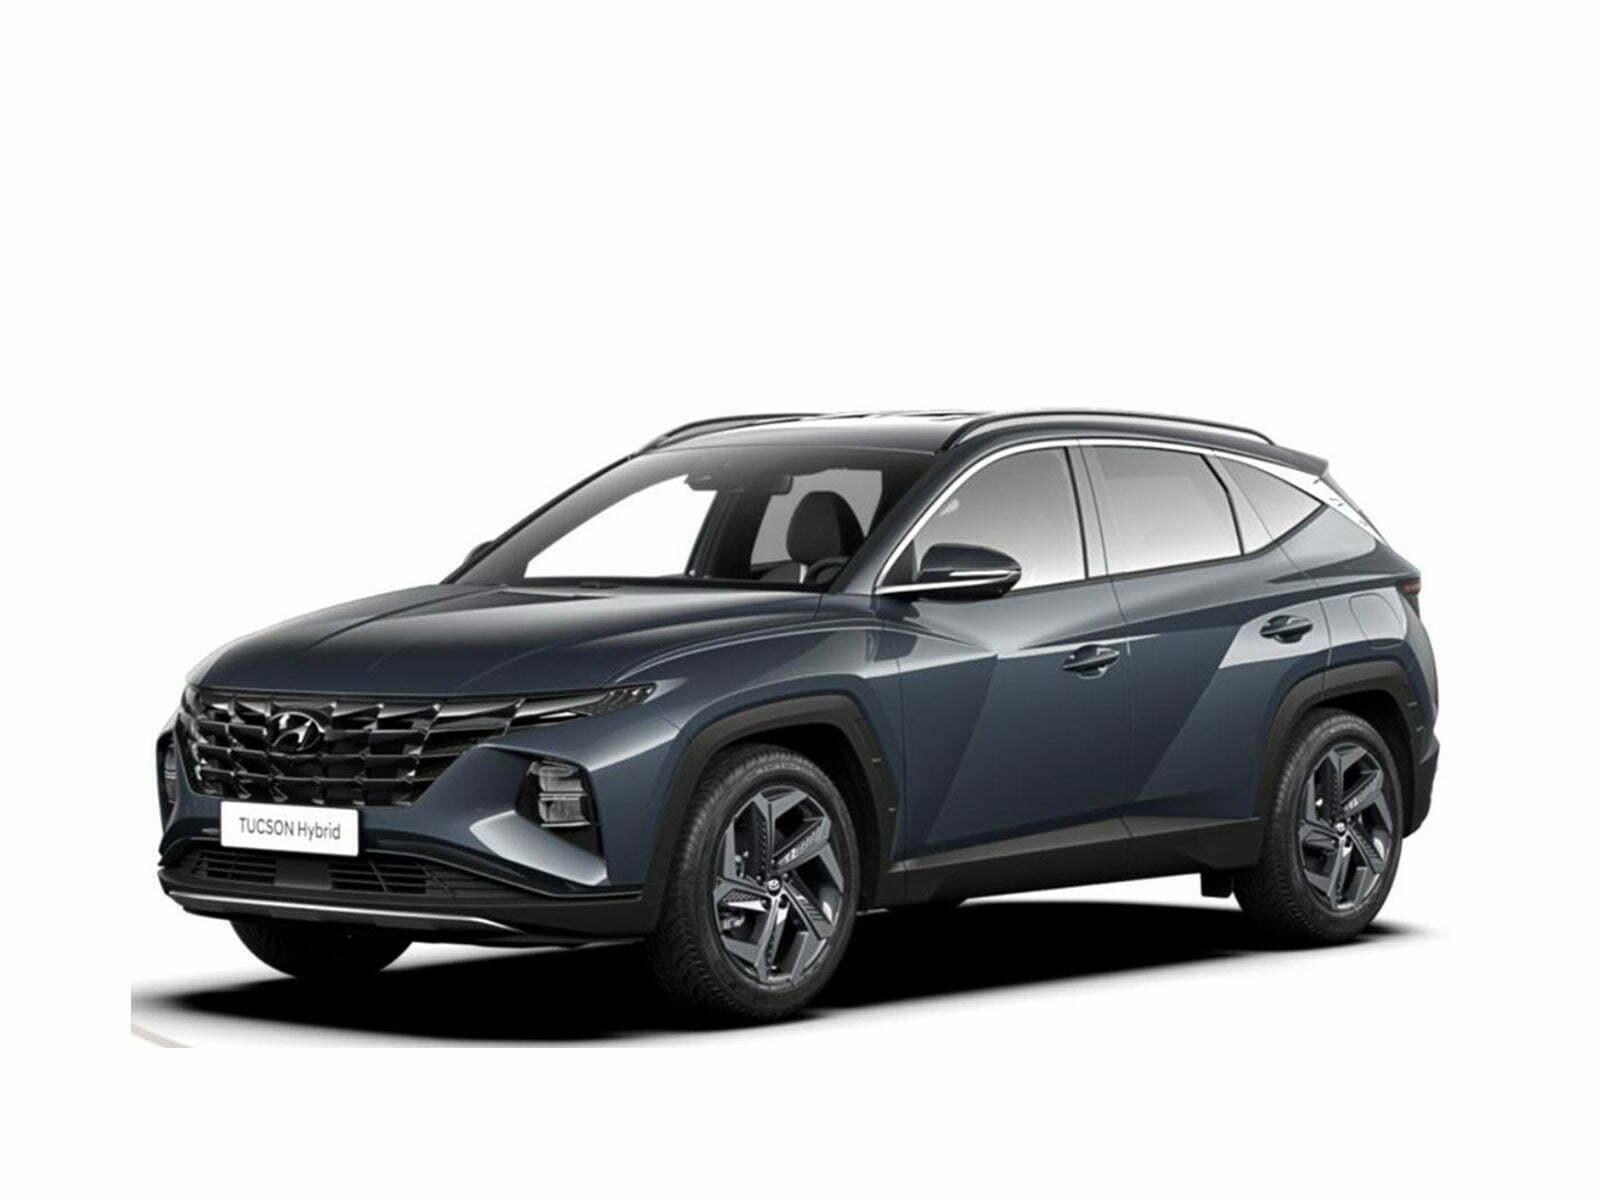 Hyundai Tucson 1.6 T-GDI 48V MHEV i-Motion 5d.